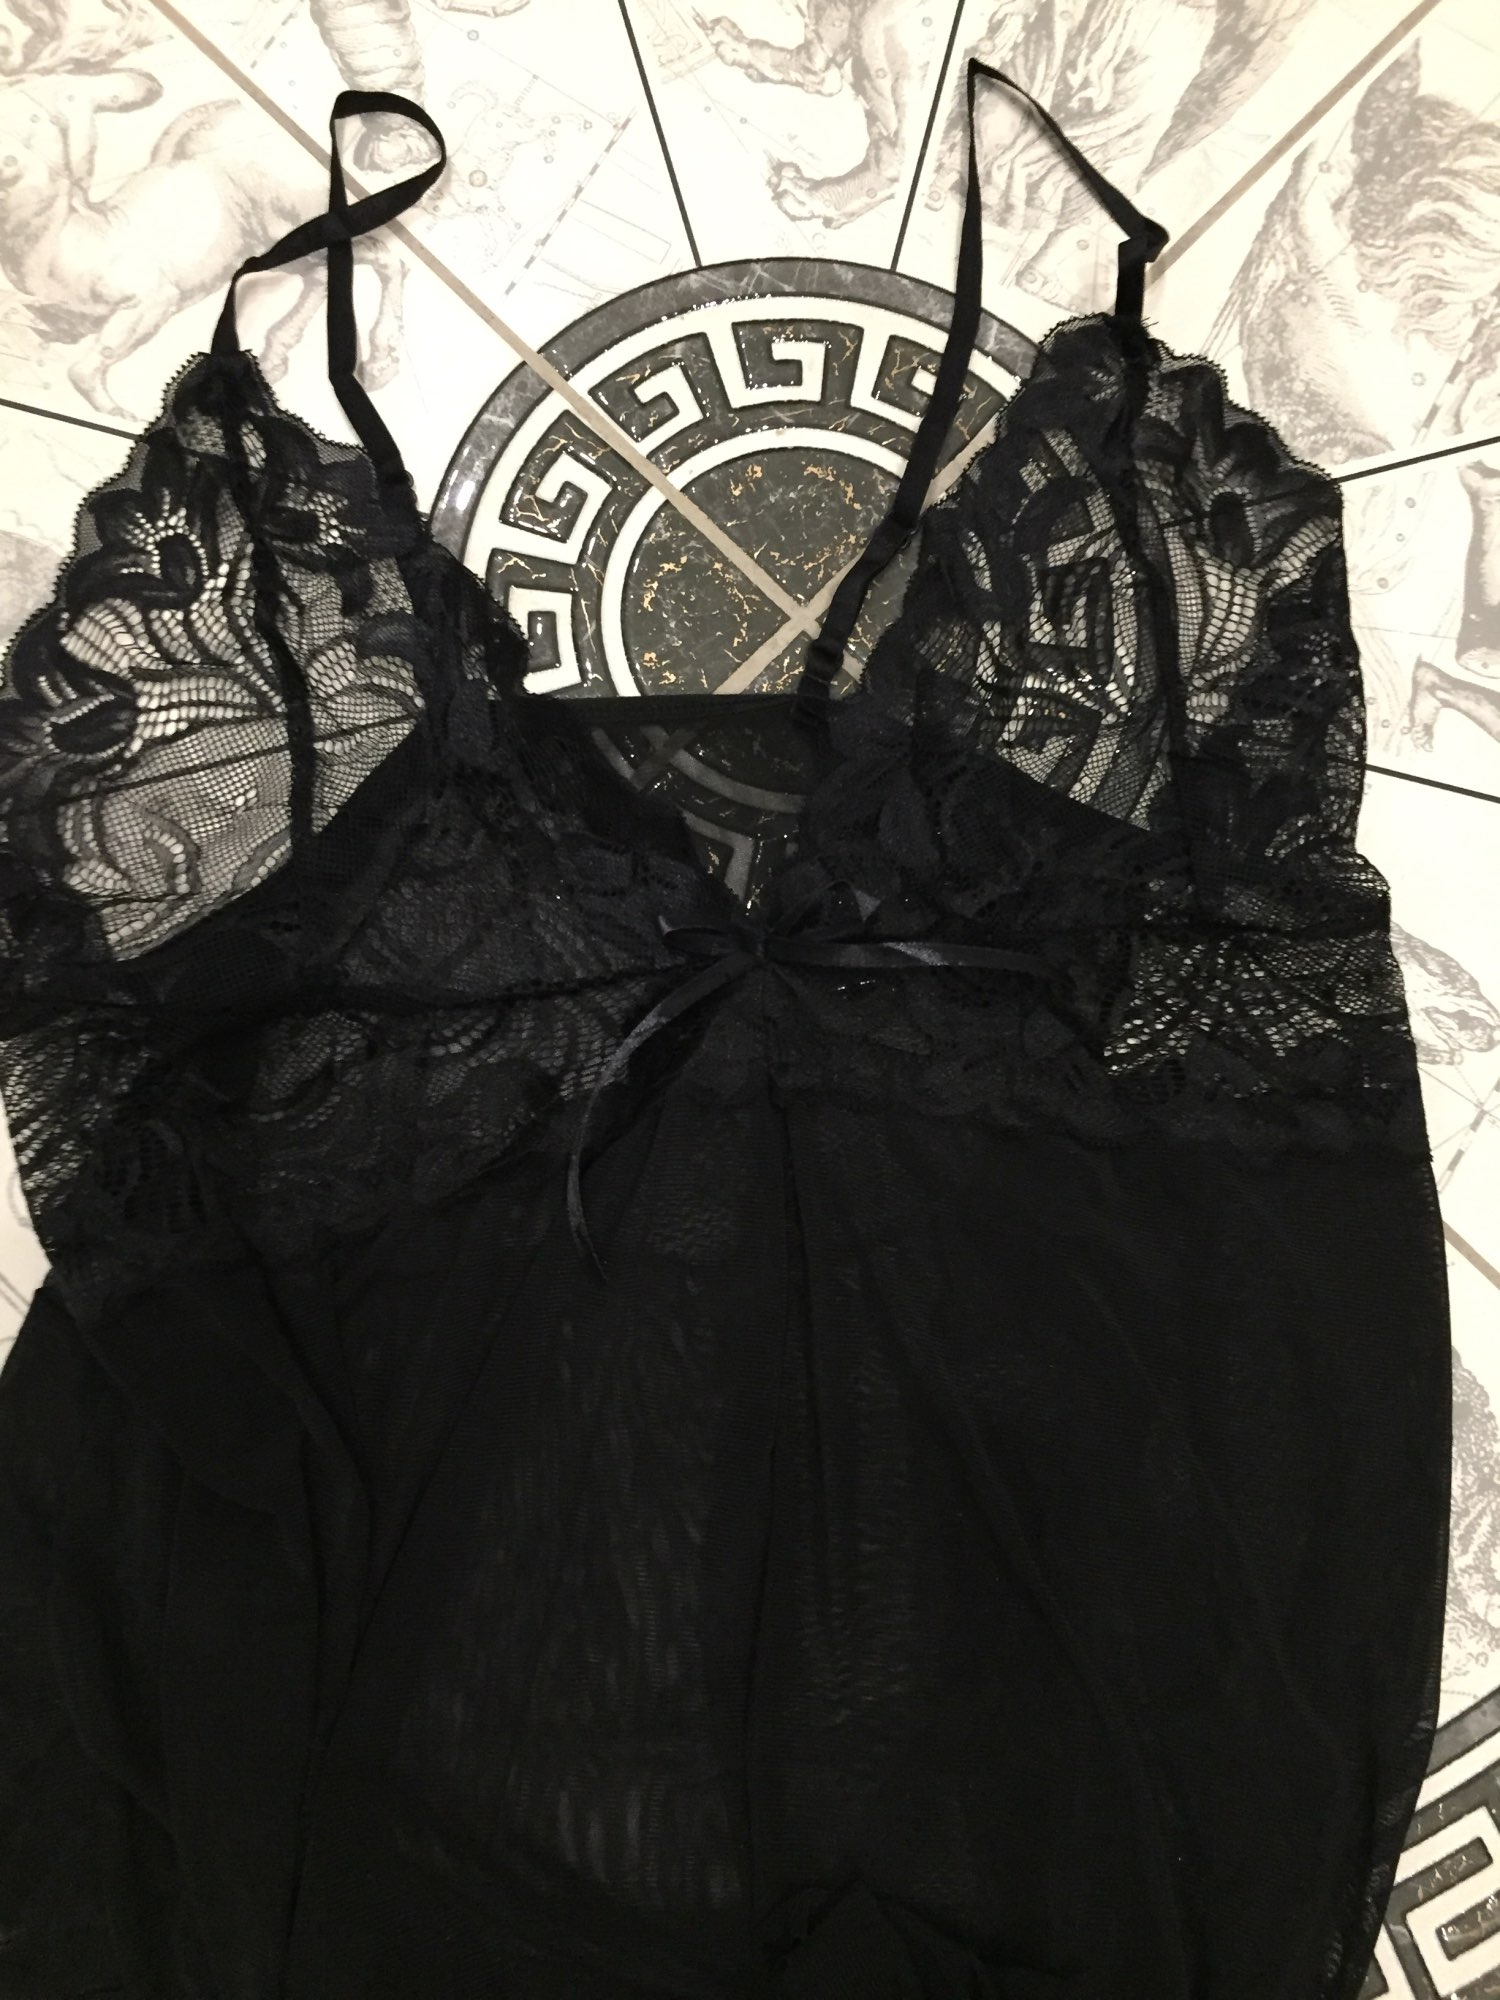 Women Sexy Nightwear See Through Plus Size S-XXXL Lace Nightgown Sleepwear Dress G-String Sexy Lingerie Robe photo review